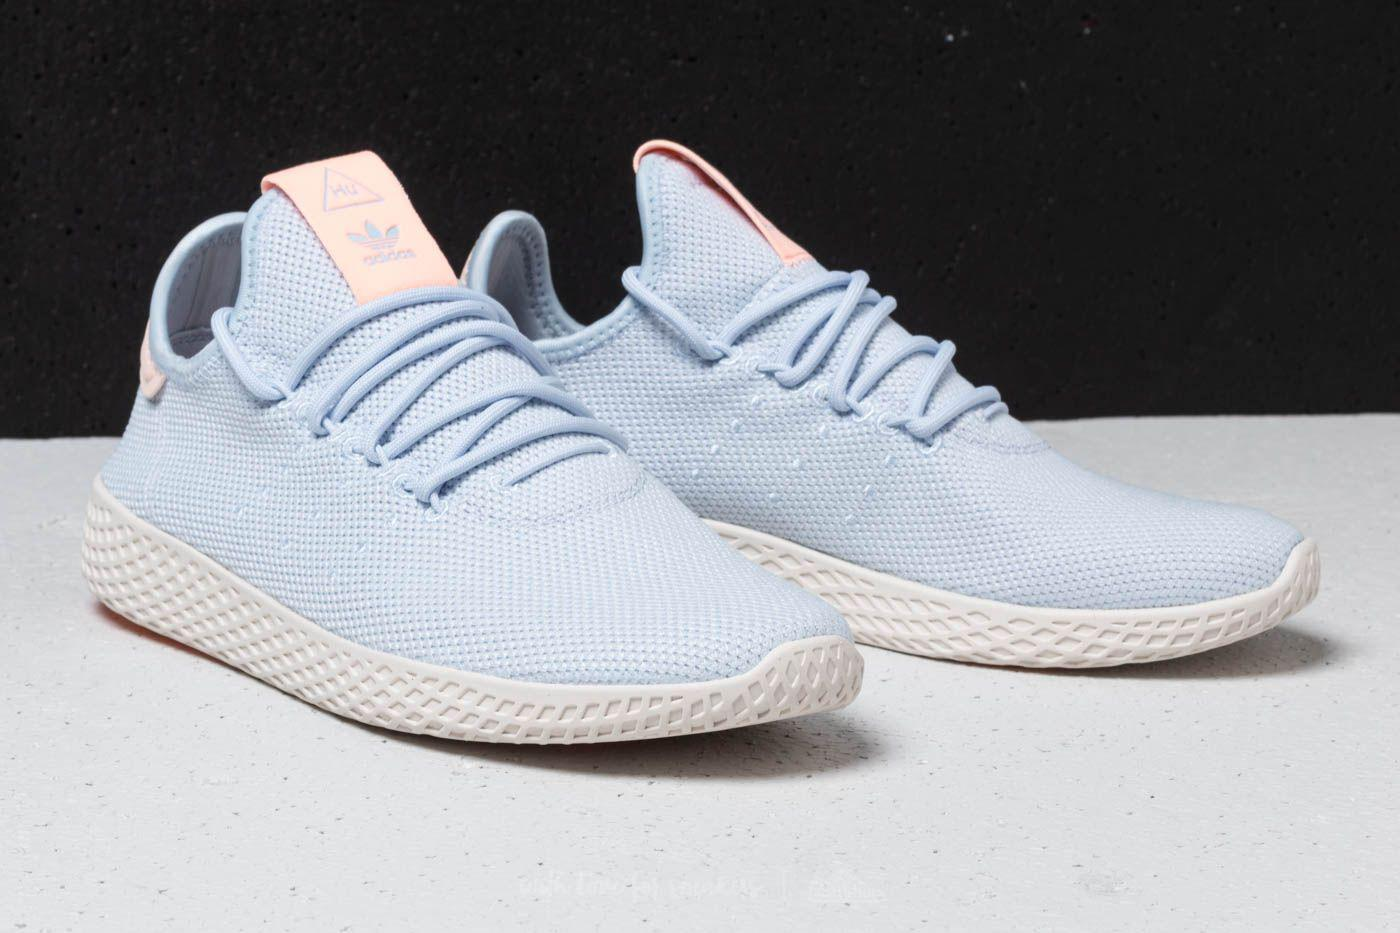 47df491d2655 Lyst - adidas Originals Adidas Pharrell Williams Tennis Hu W Aero ...